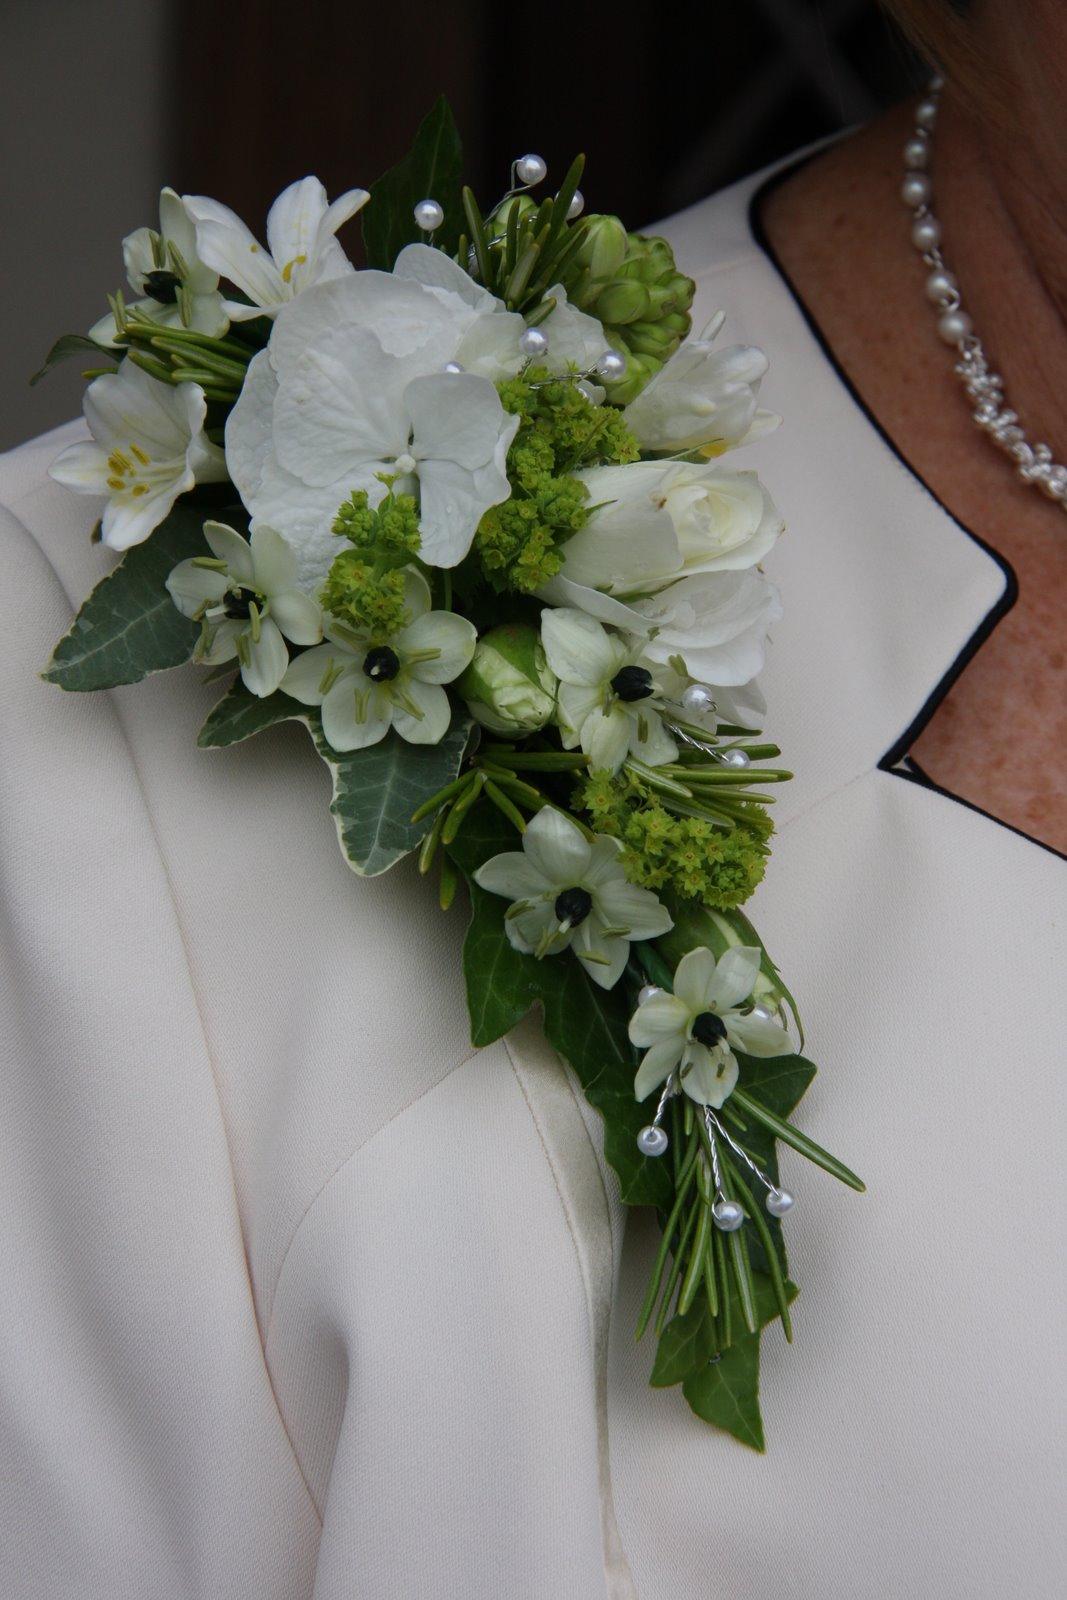 Flower Design Buttonhole & Corsage Blog Ivory & Black Epaulette Corsage